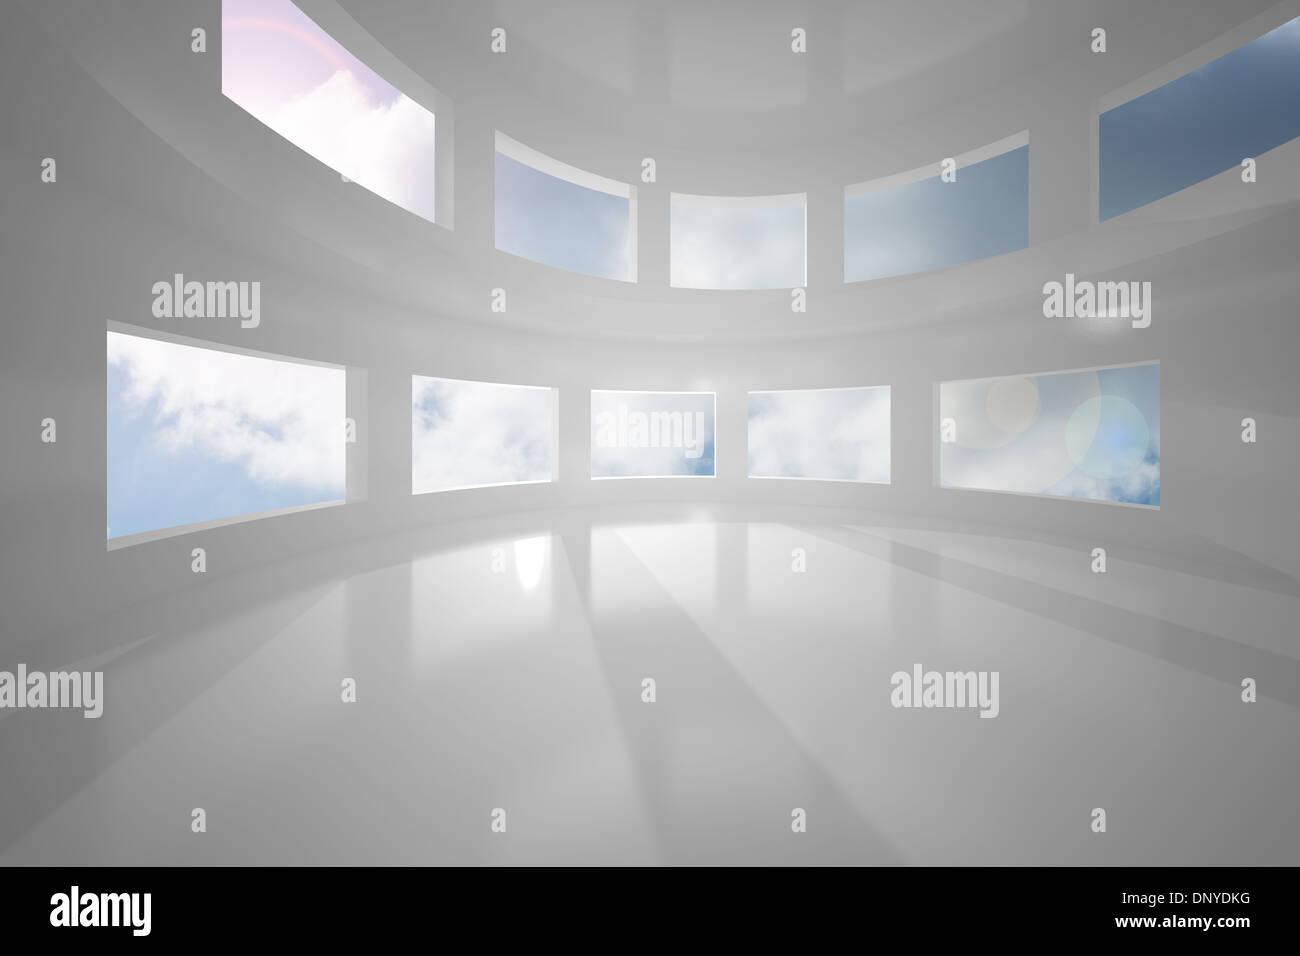 Sun shining through windows - Stock Image